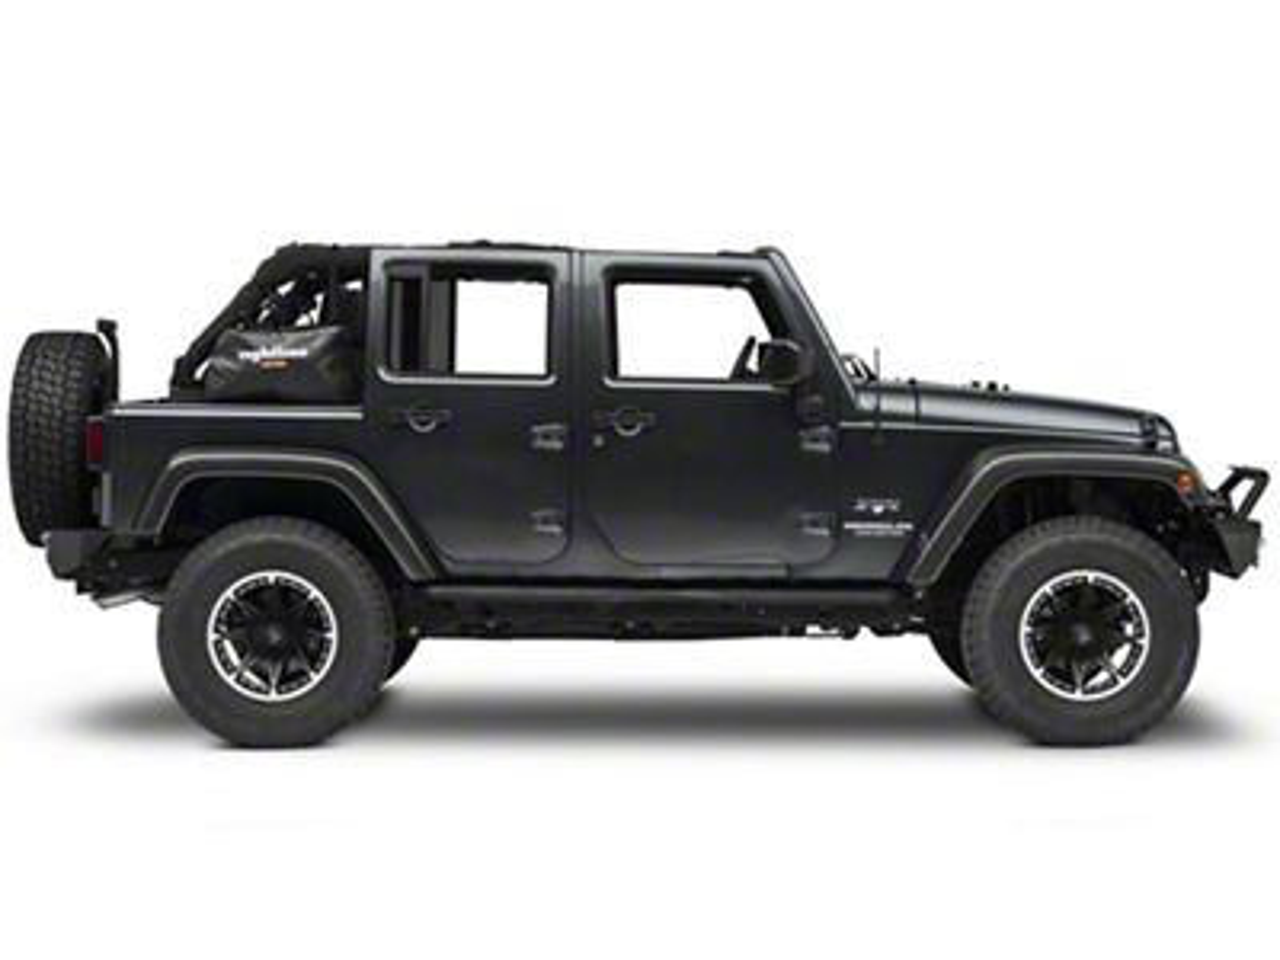 Interior Accessories 4 Door Rightline Gear 100j75 B Side Storage Bags For Jeep Wrangler Jk Automotive Samel Com Br